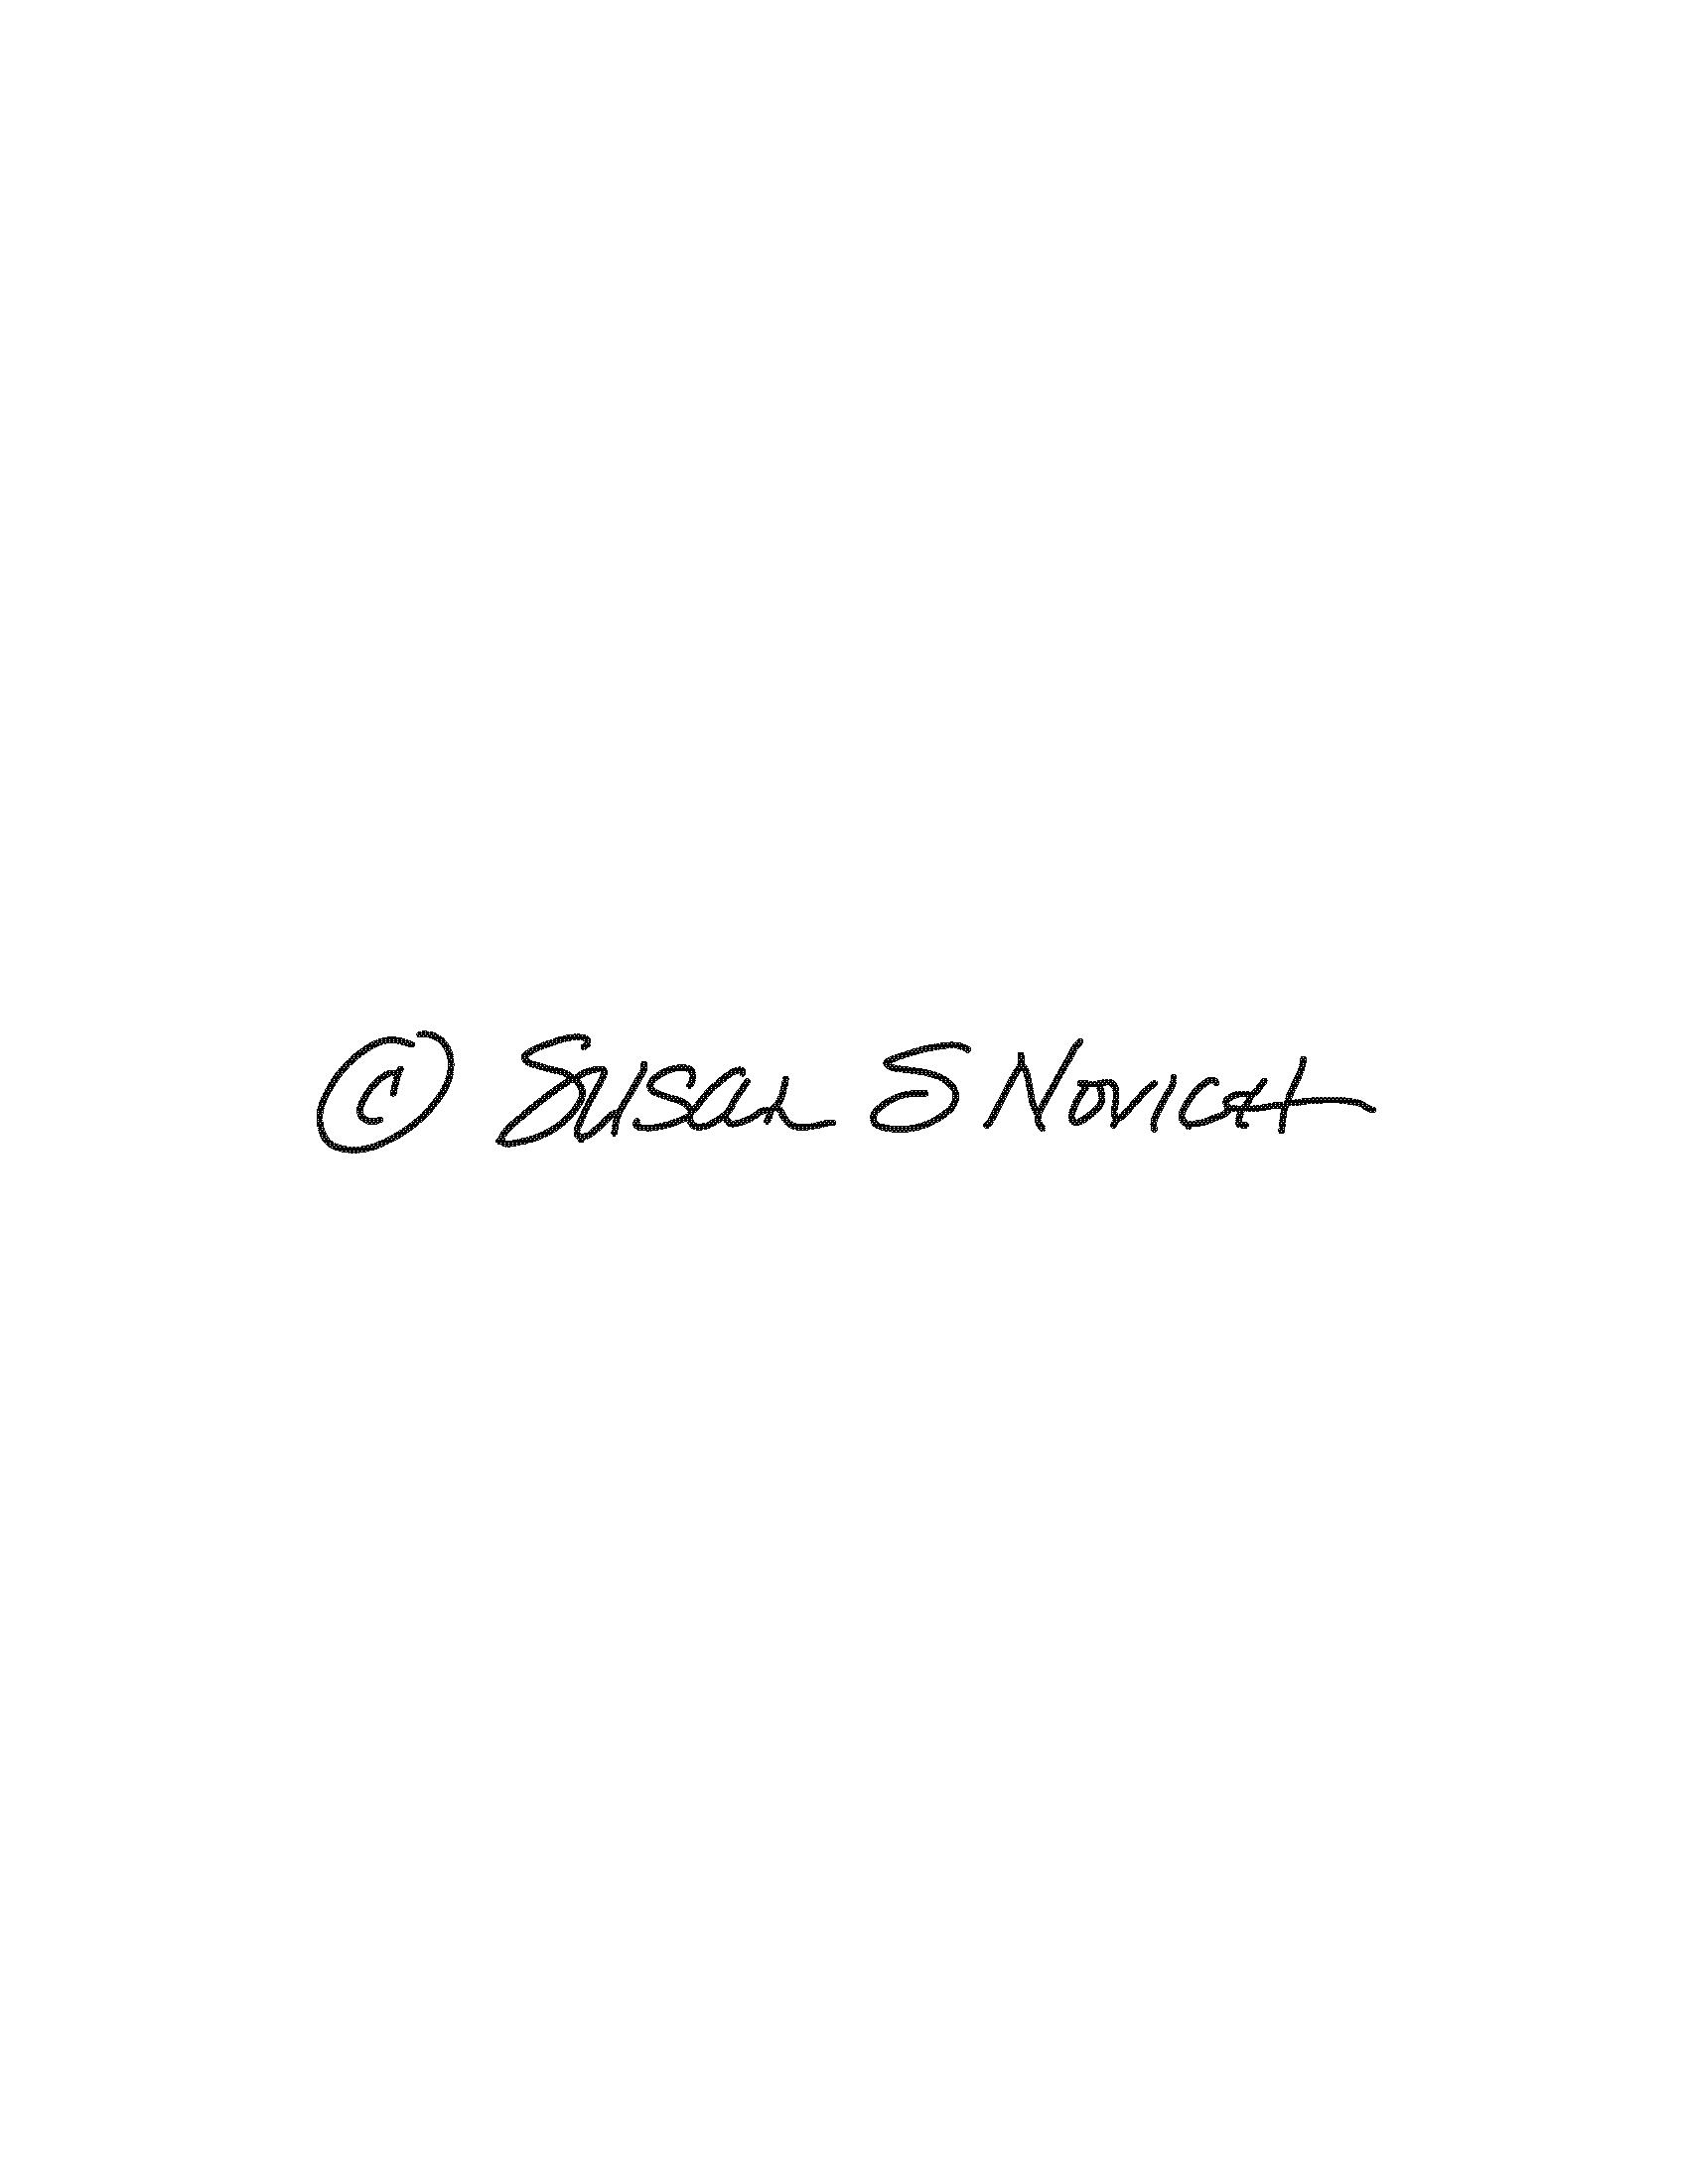 Susan Novich Signature